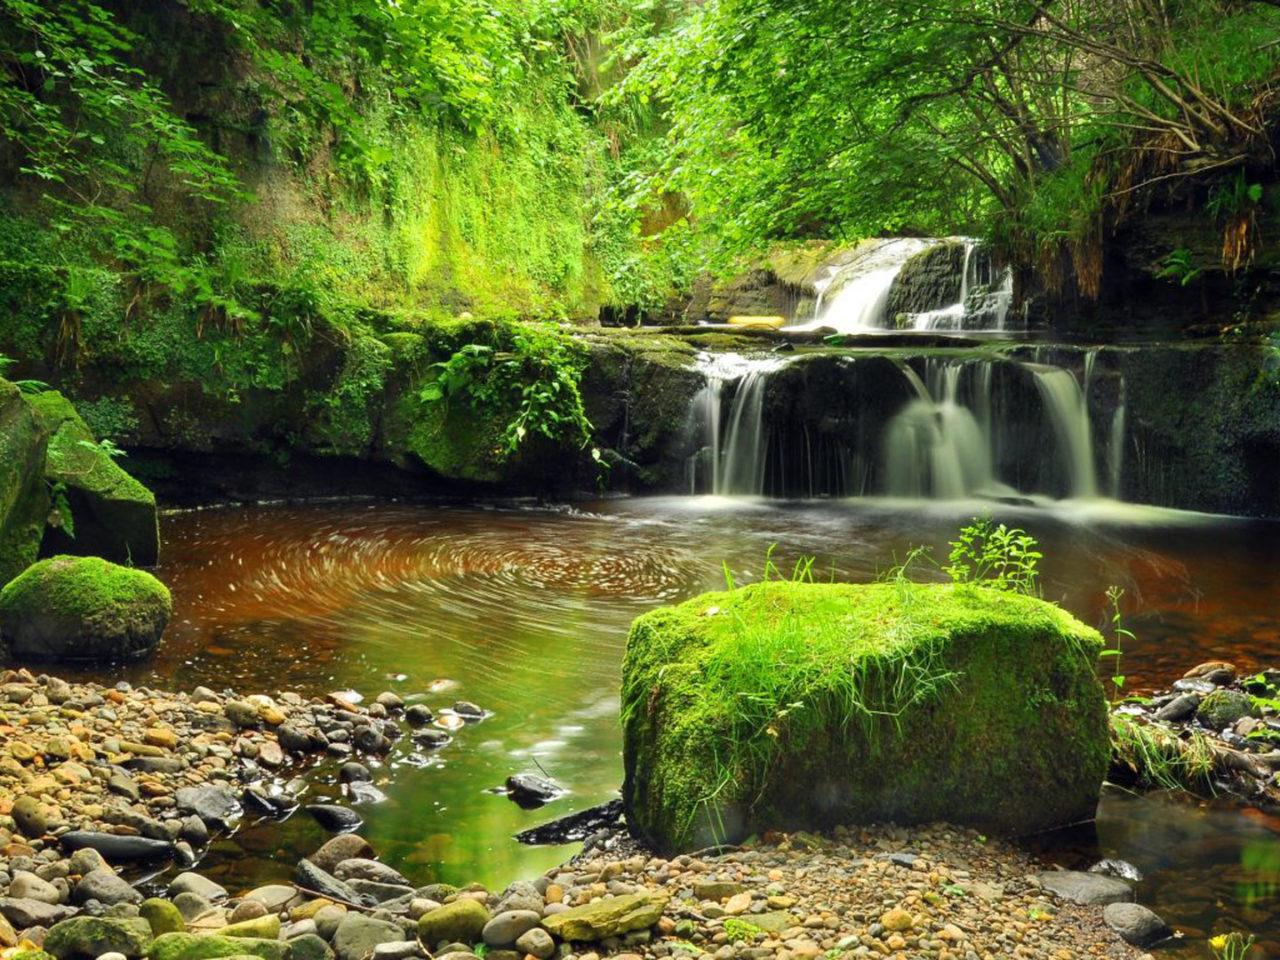 Bordered Iphone X Wallpaper Waterfall Stream Pond Cascades Gravel Rocks Green Moss